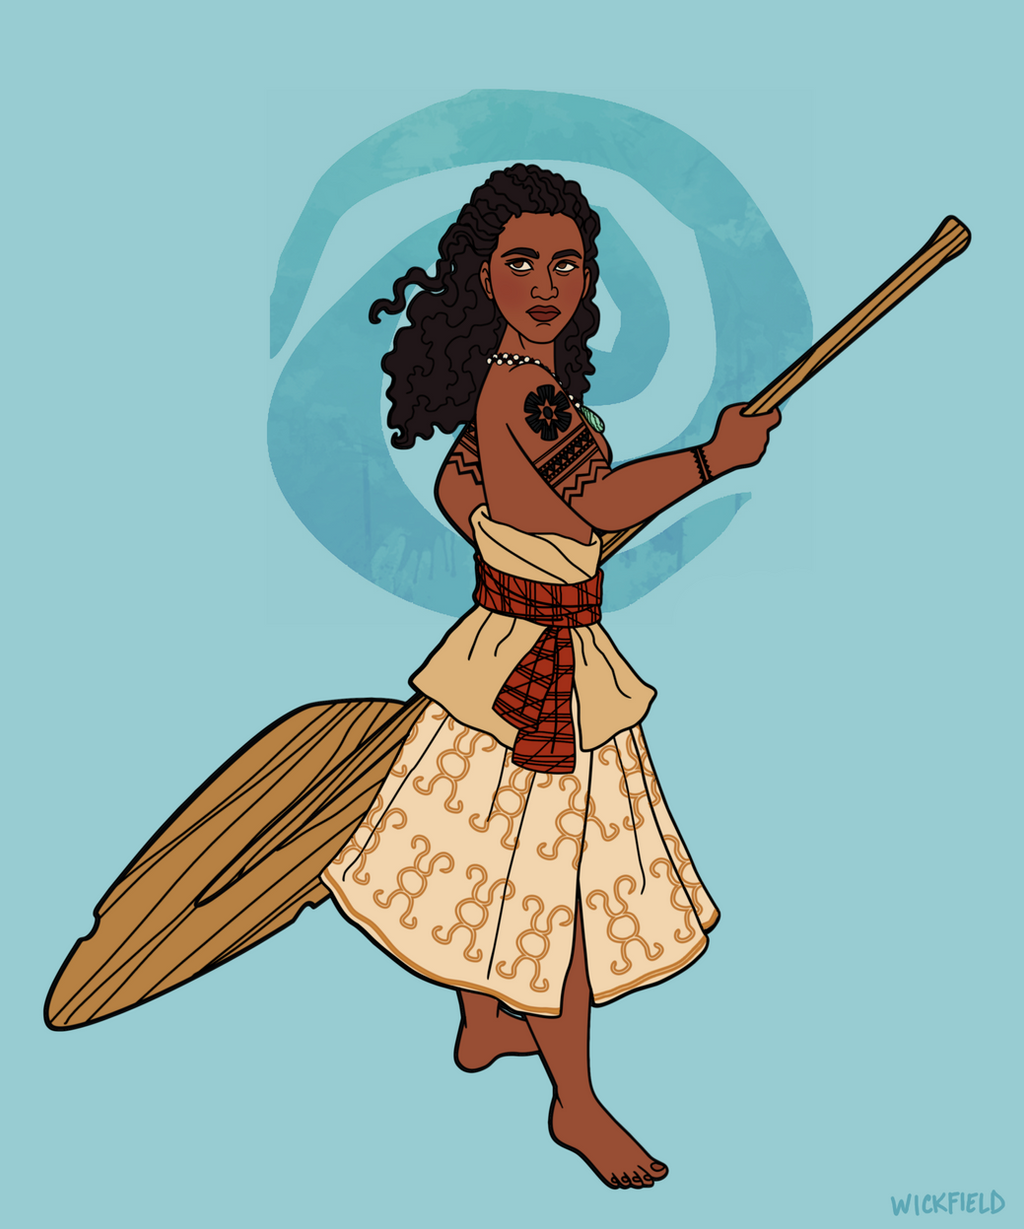 Ancient Moana by Wickfield